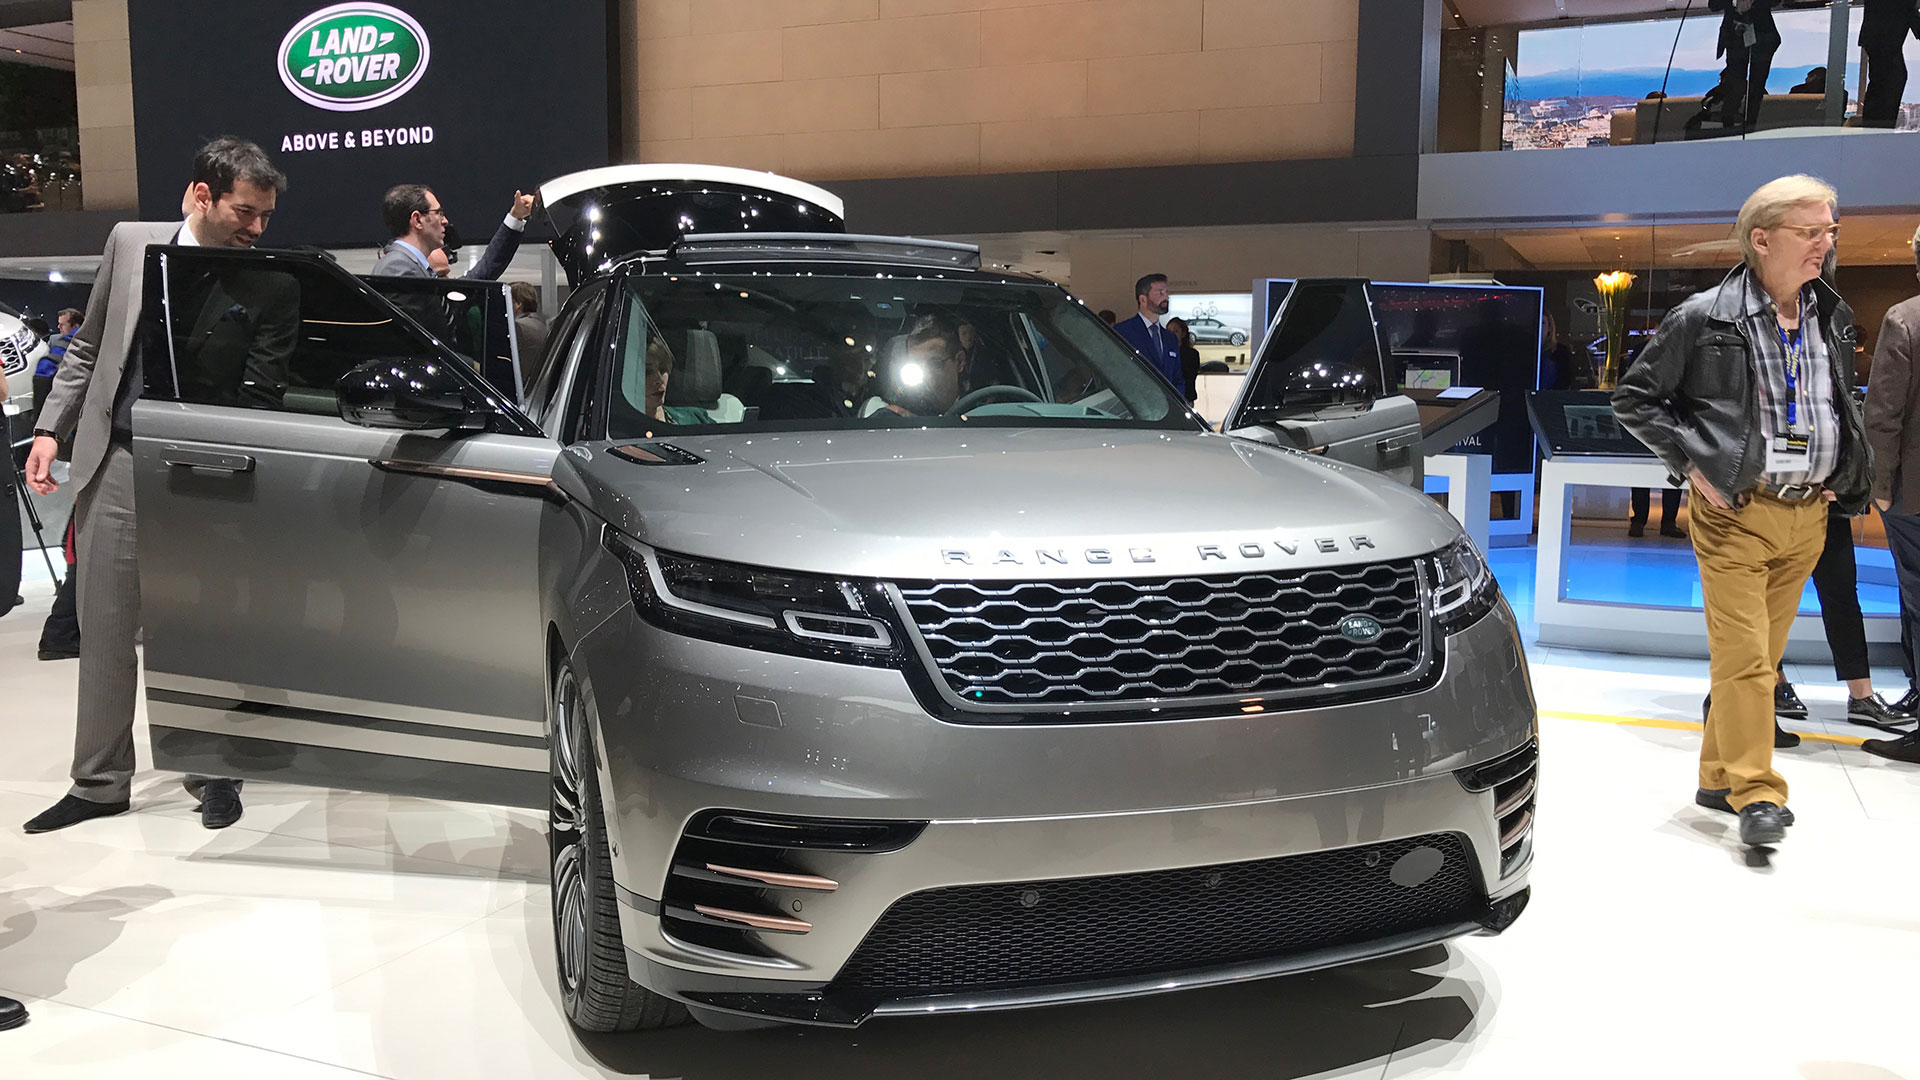 land-rover-ginevra-2017-11